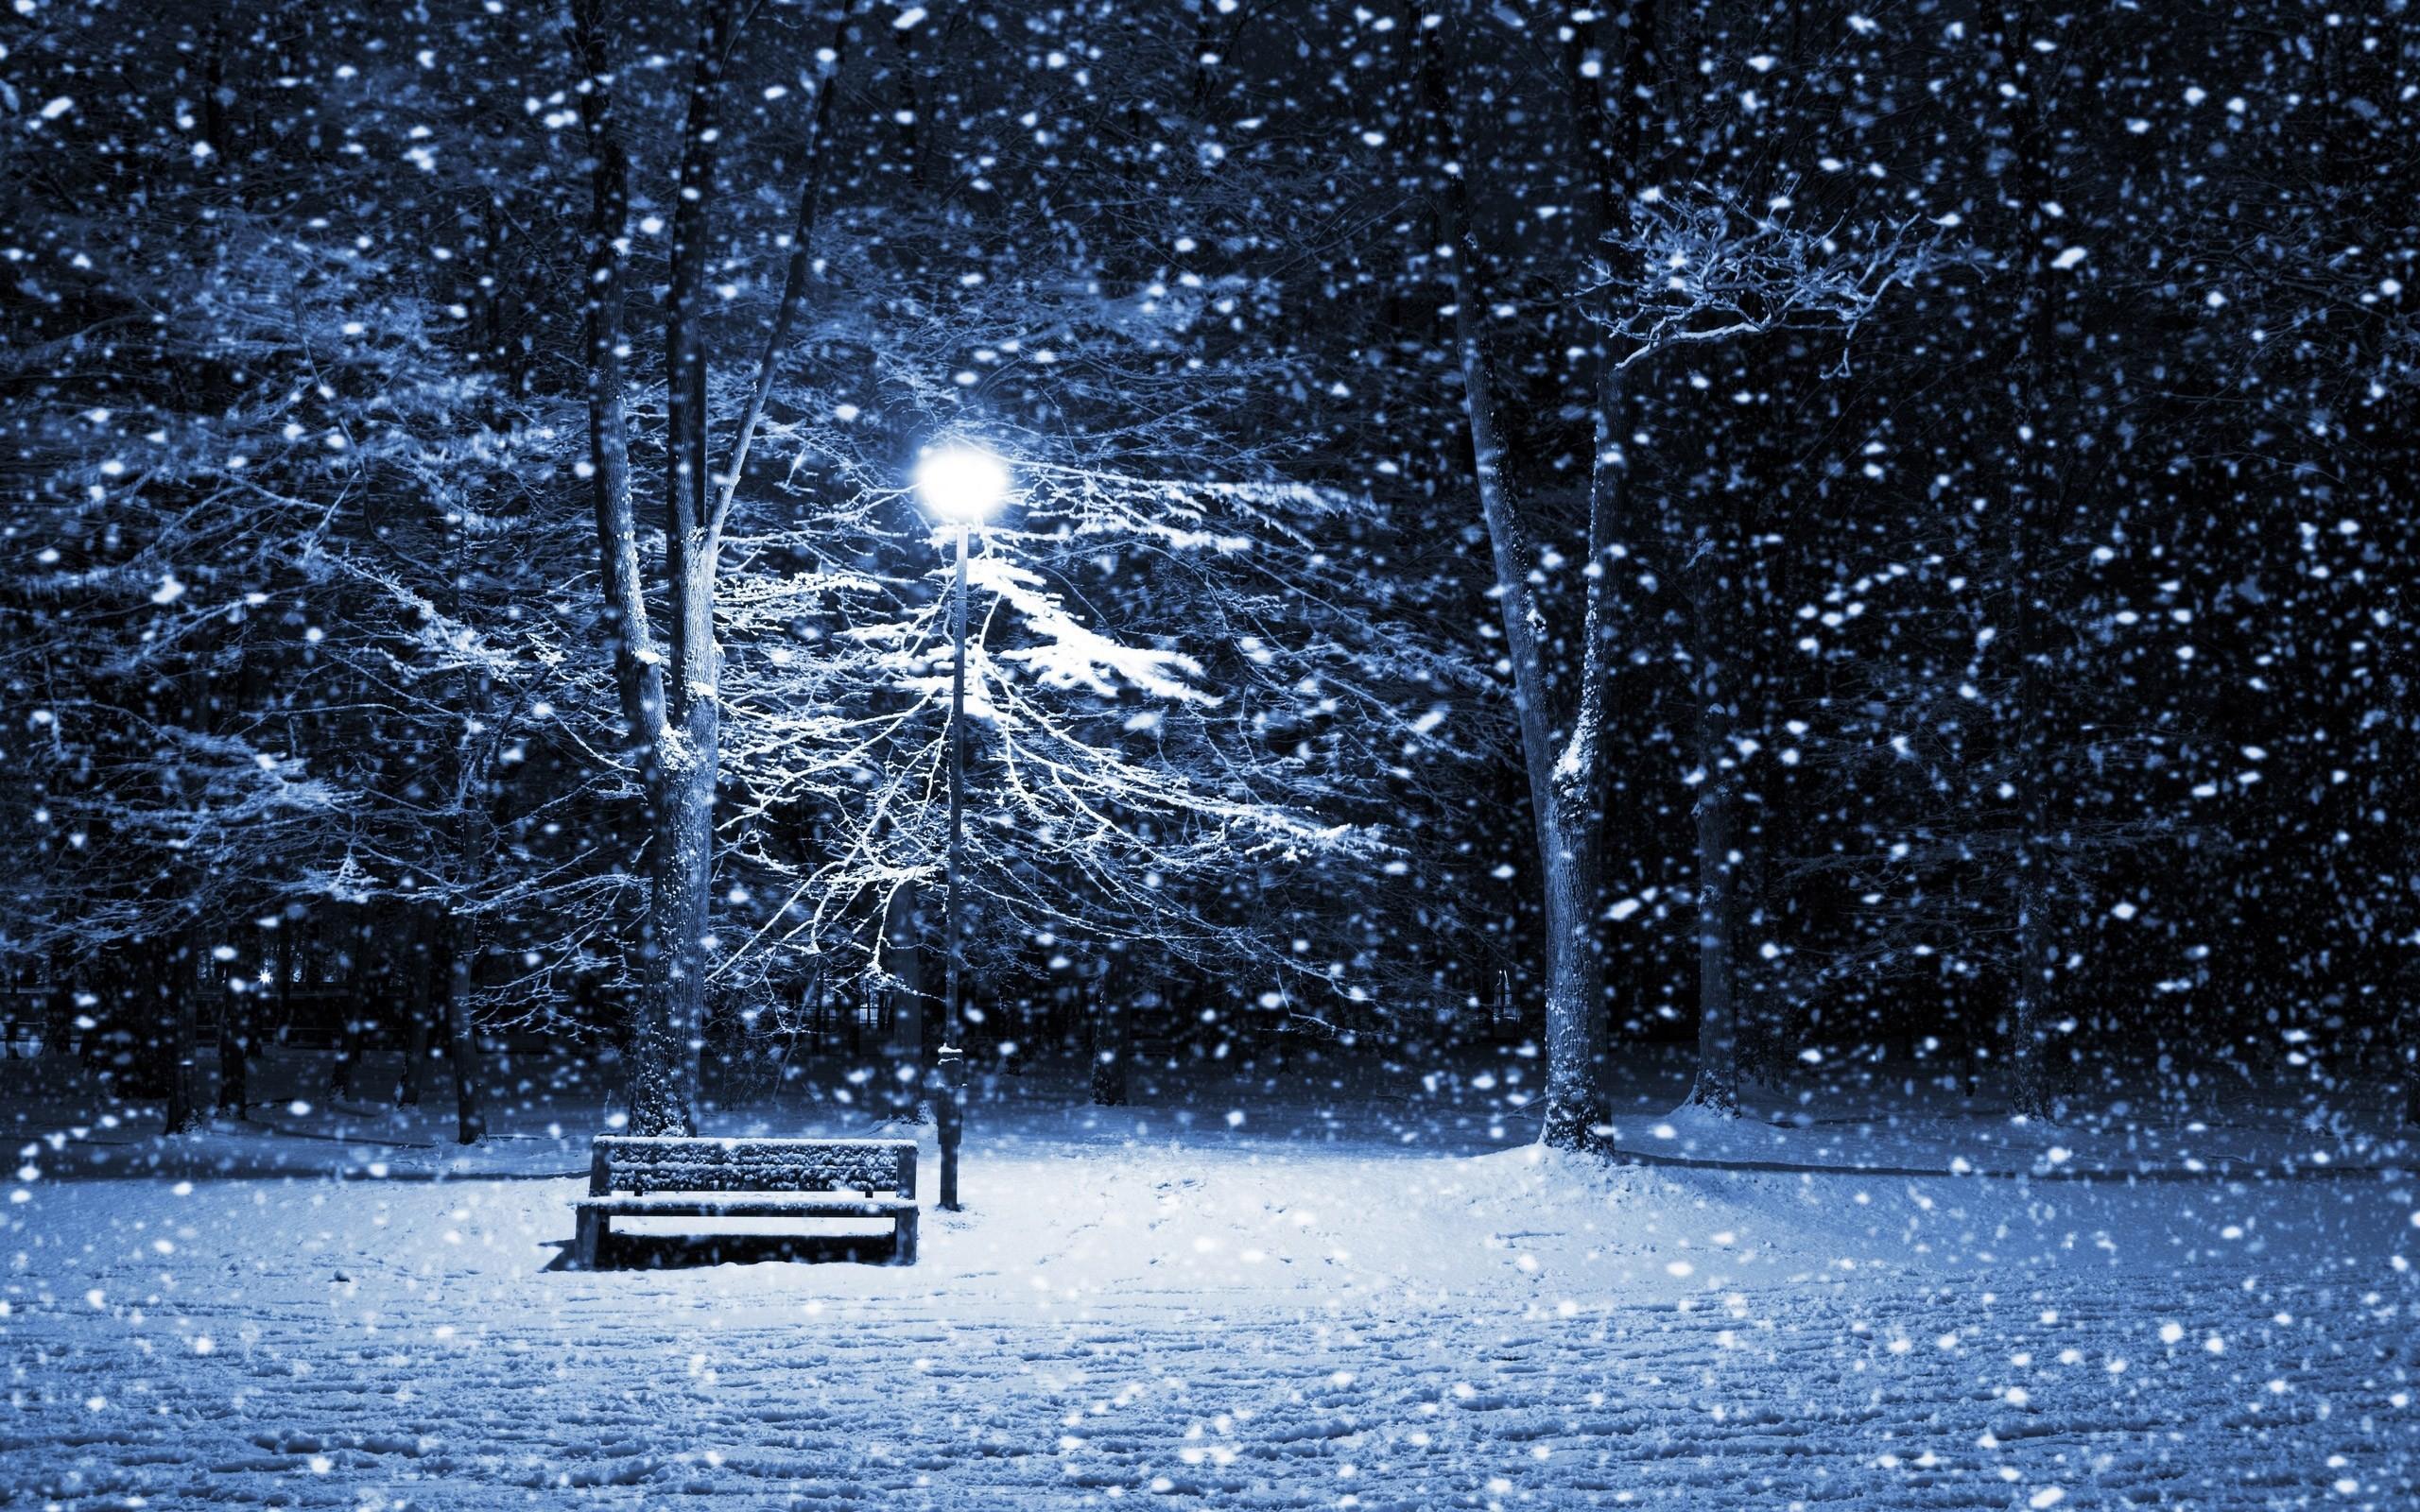 Winter-Scenes-Wallpaper-Free